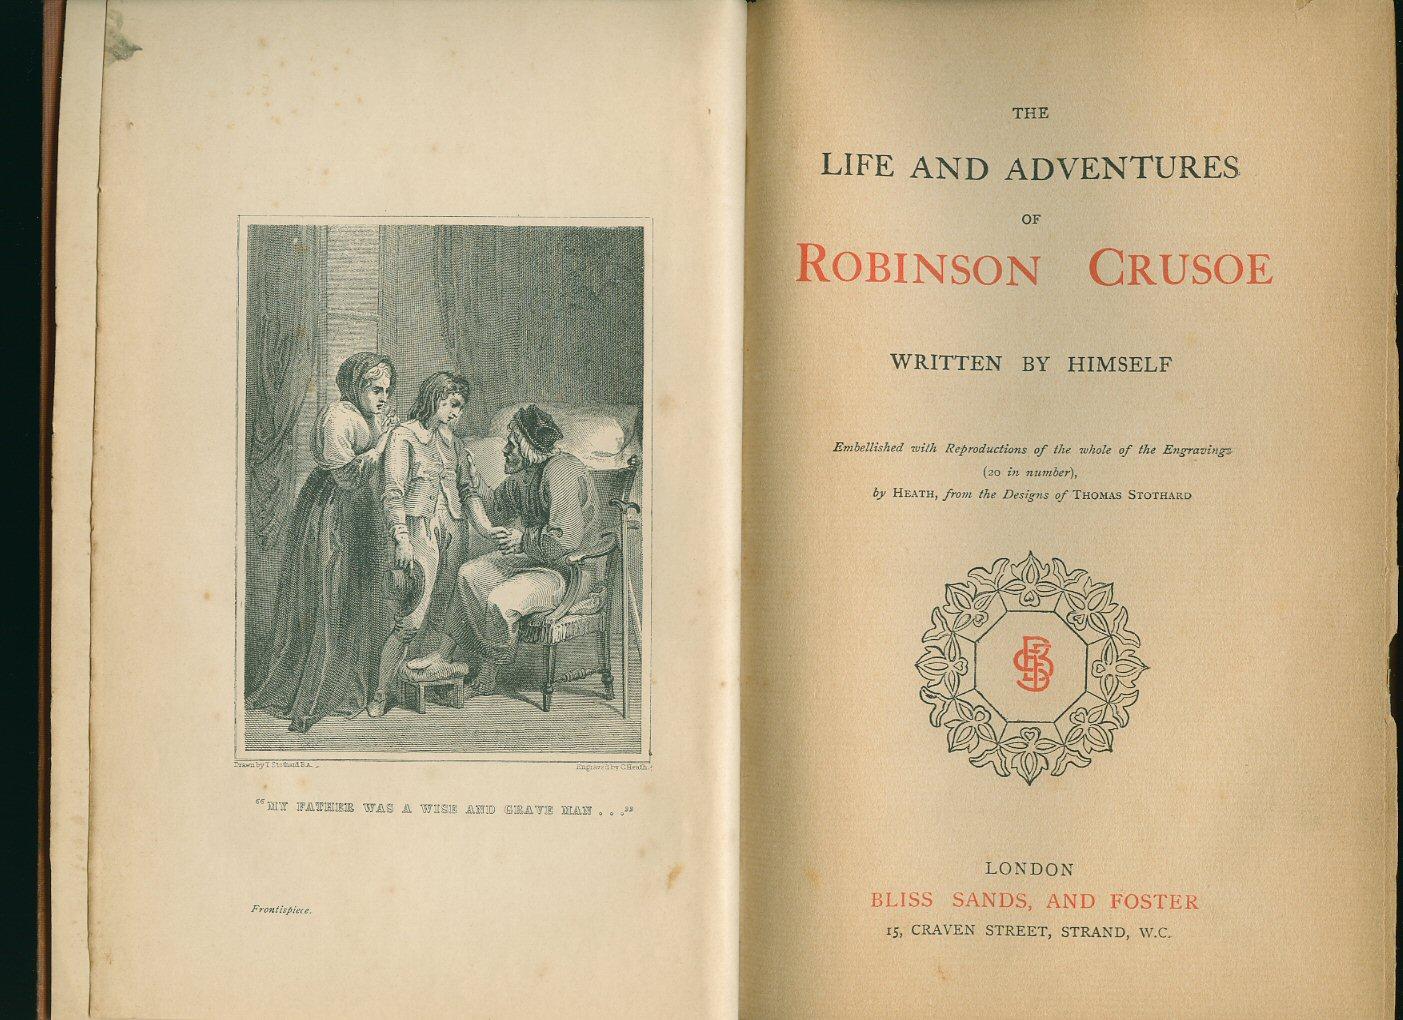 edwin arlington robinson biography essay